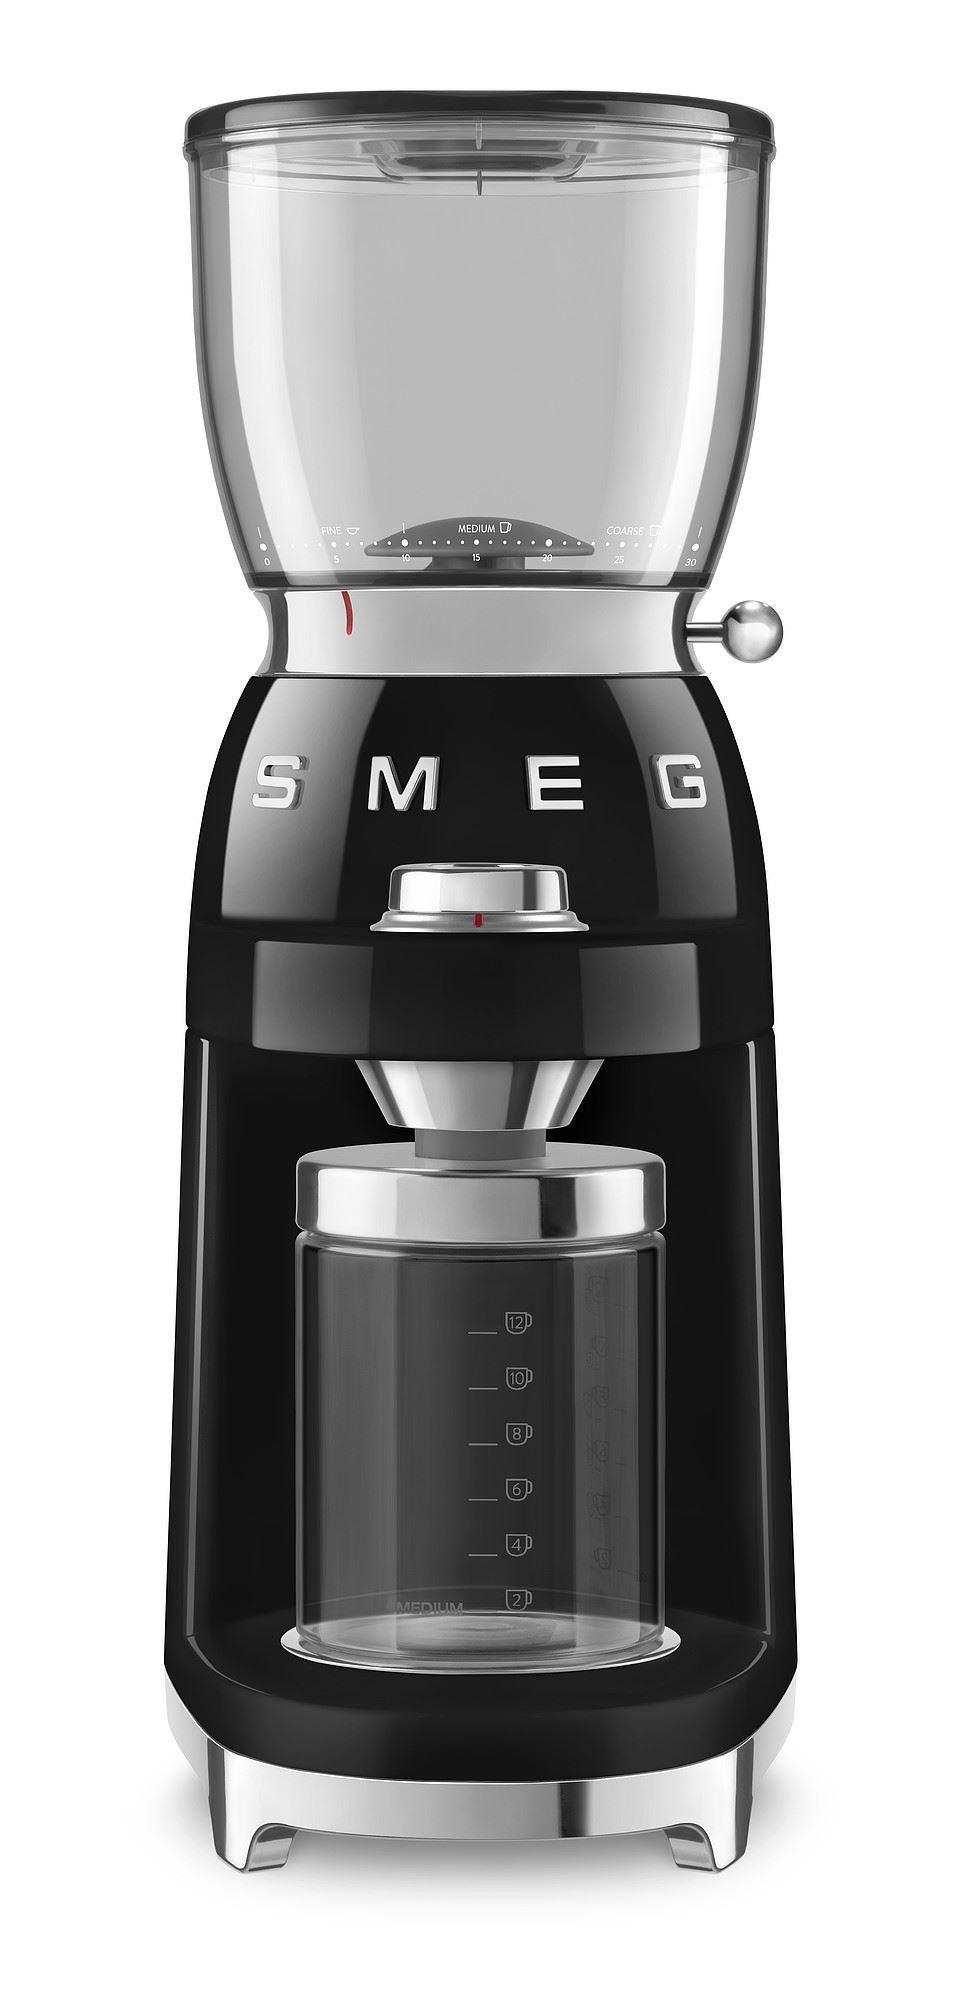 SMEG Kaffeemühle 50's Style